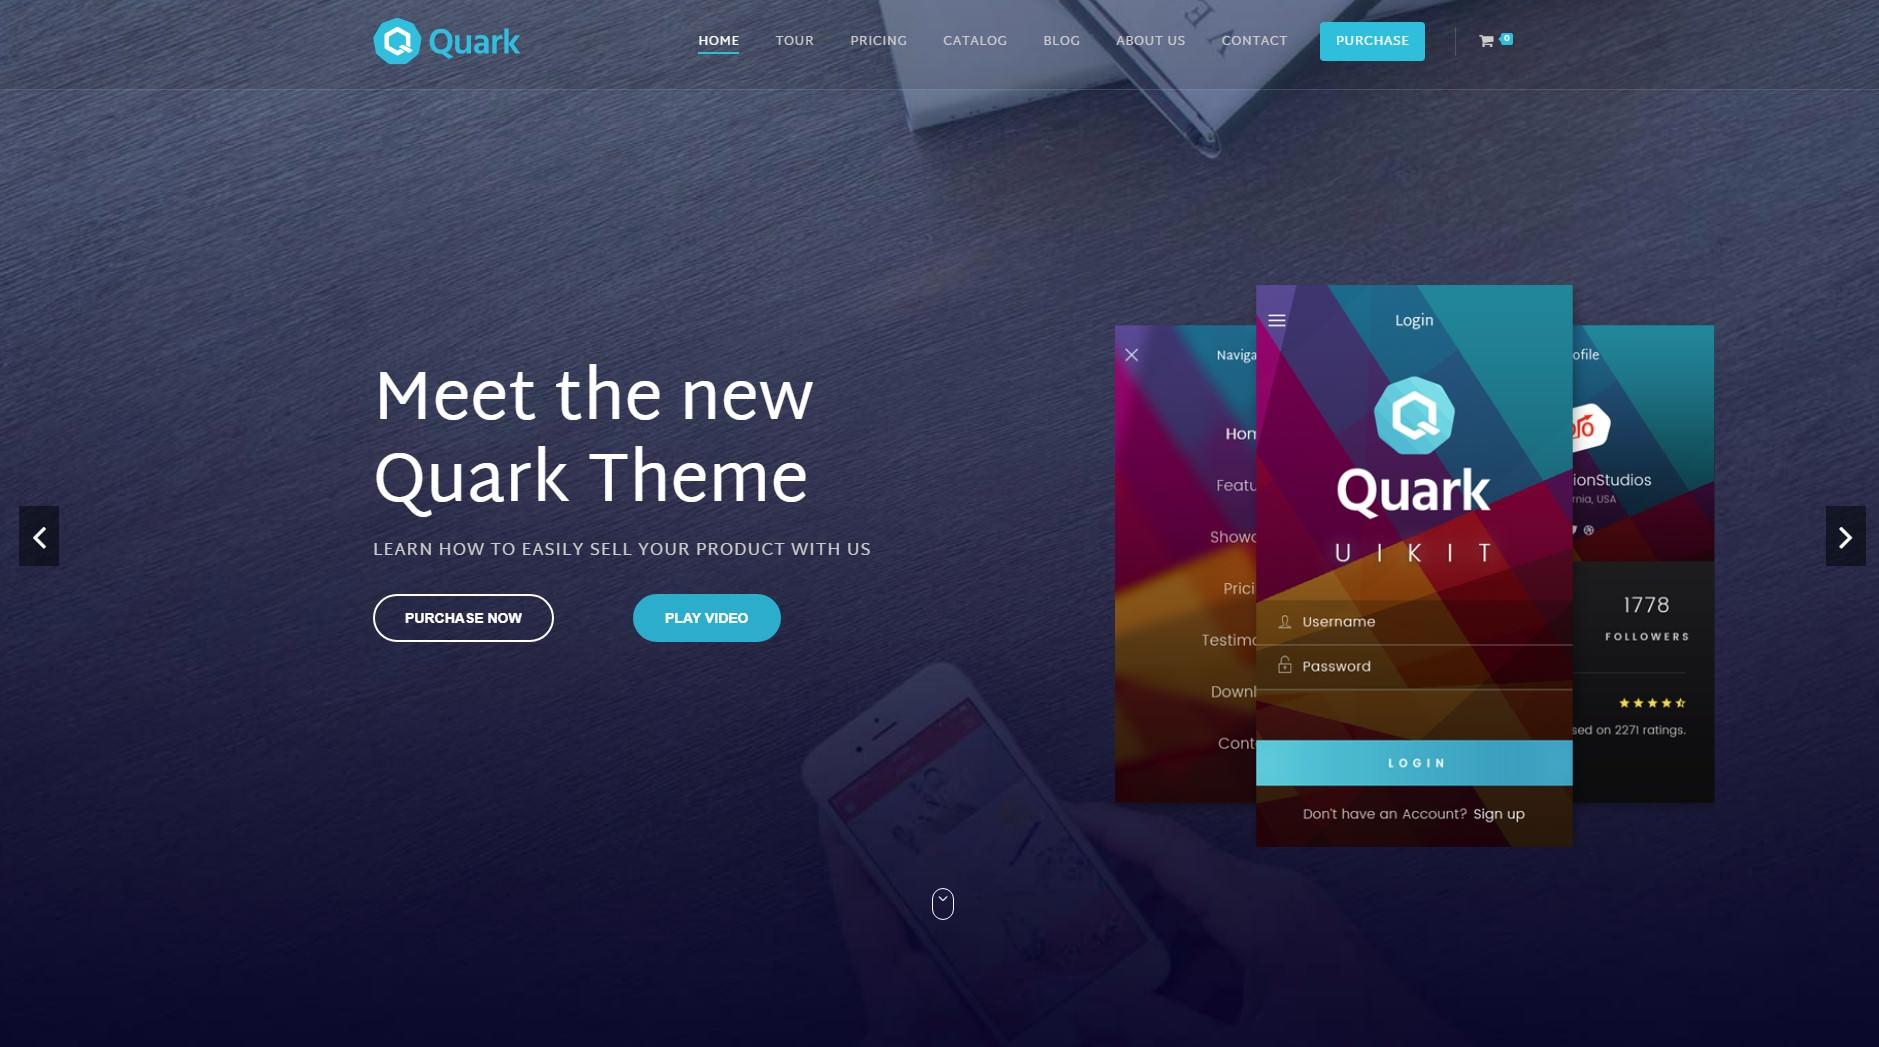 Quark theme